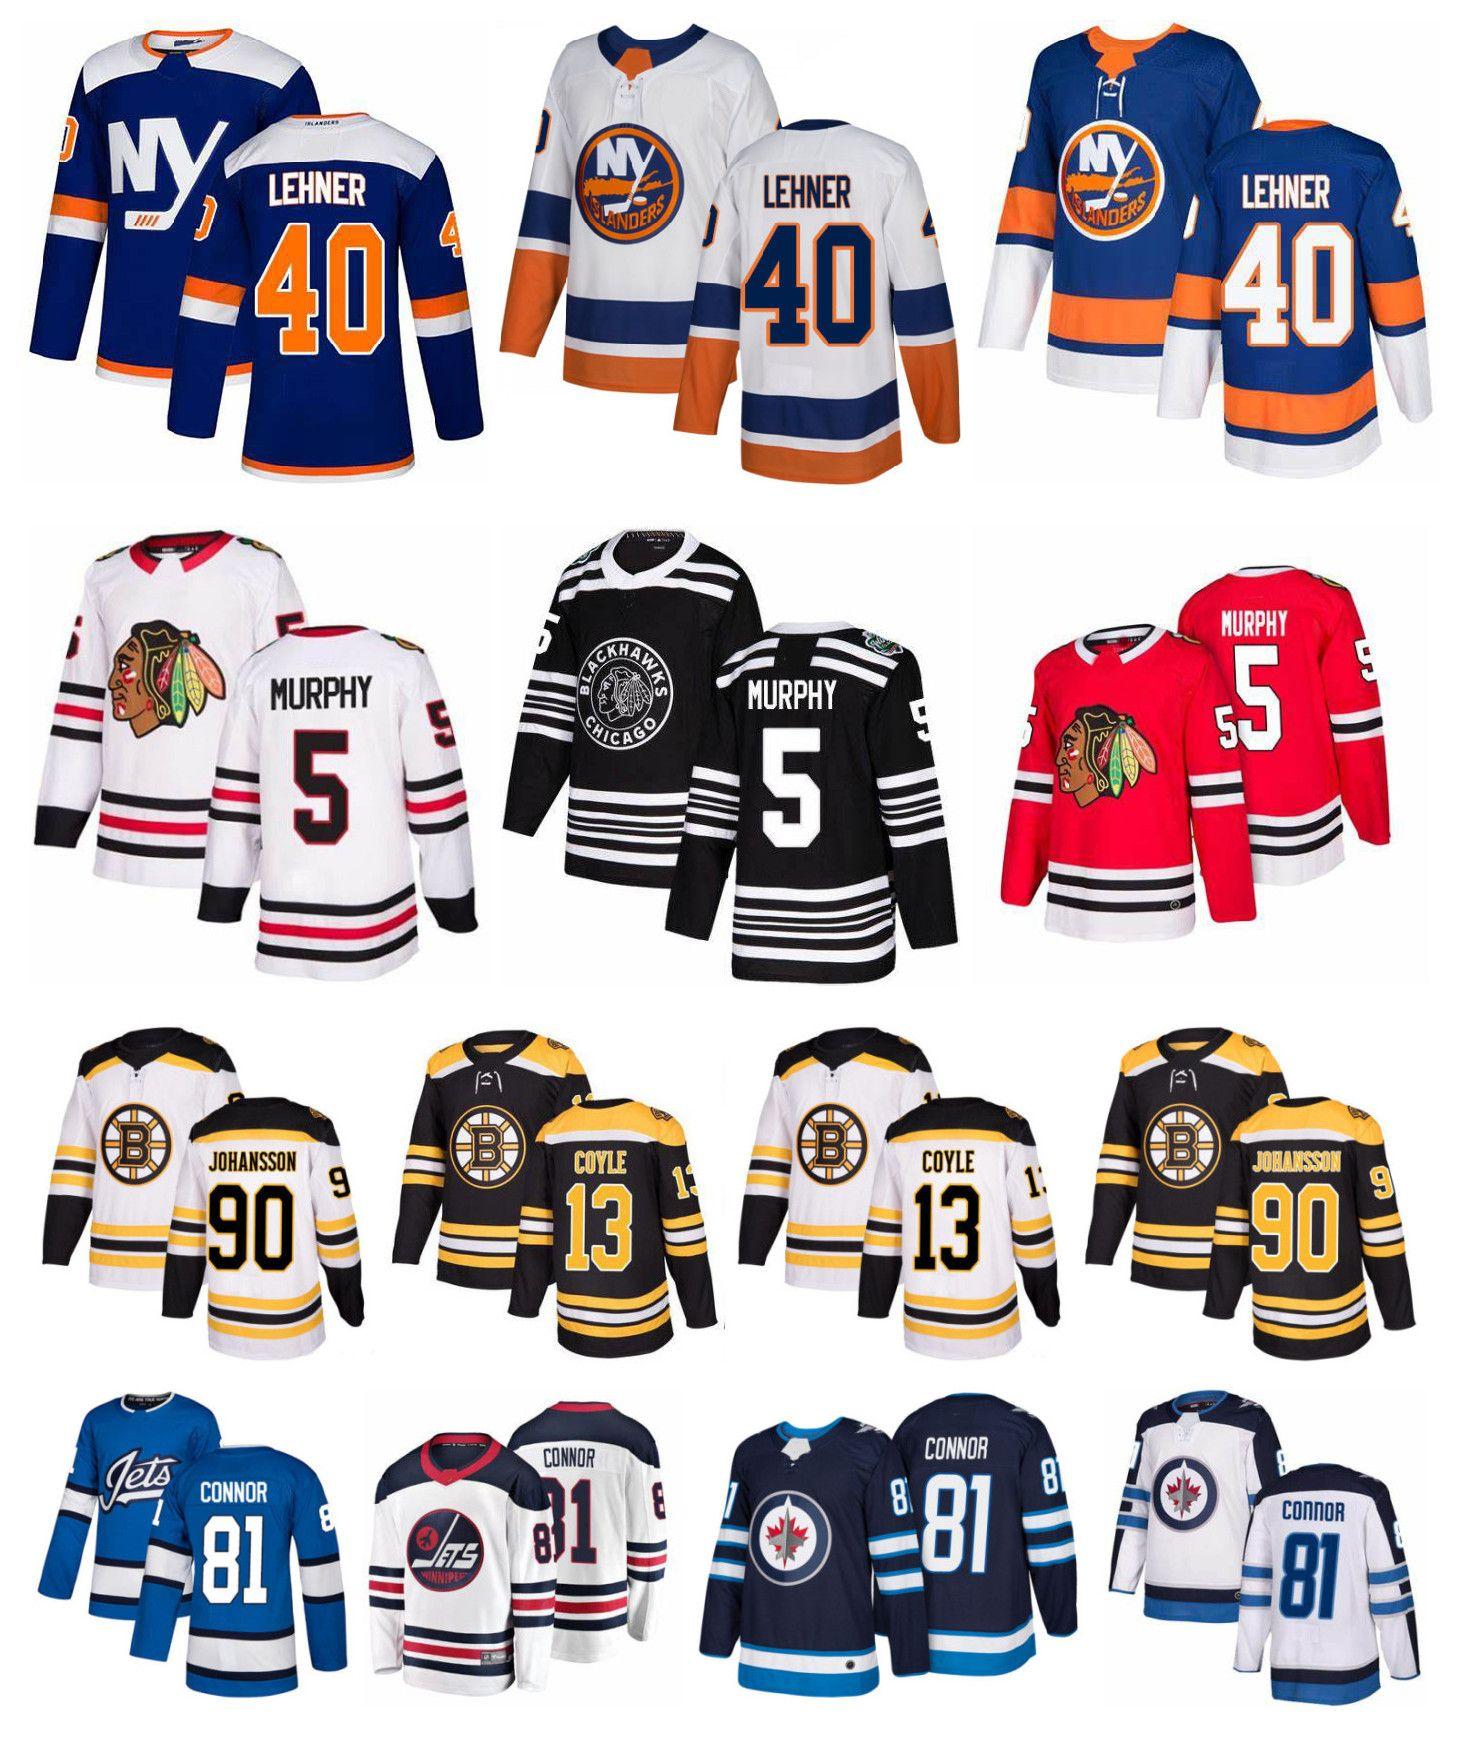 pretty nice 0d02c bd050 New York Islanders Robin Lehner Jersey Boston Bruins Charlie Coyle Marcus  Johansson Chicago Blackhawks 5 Connor Murphy Jets 81 Kyle Connor